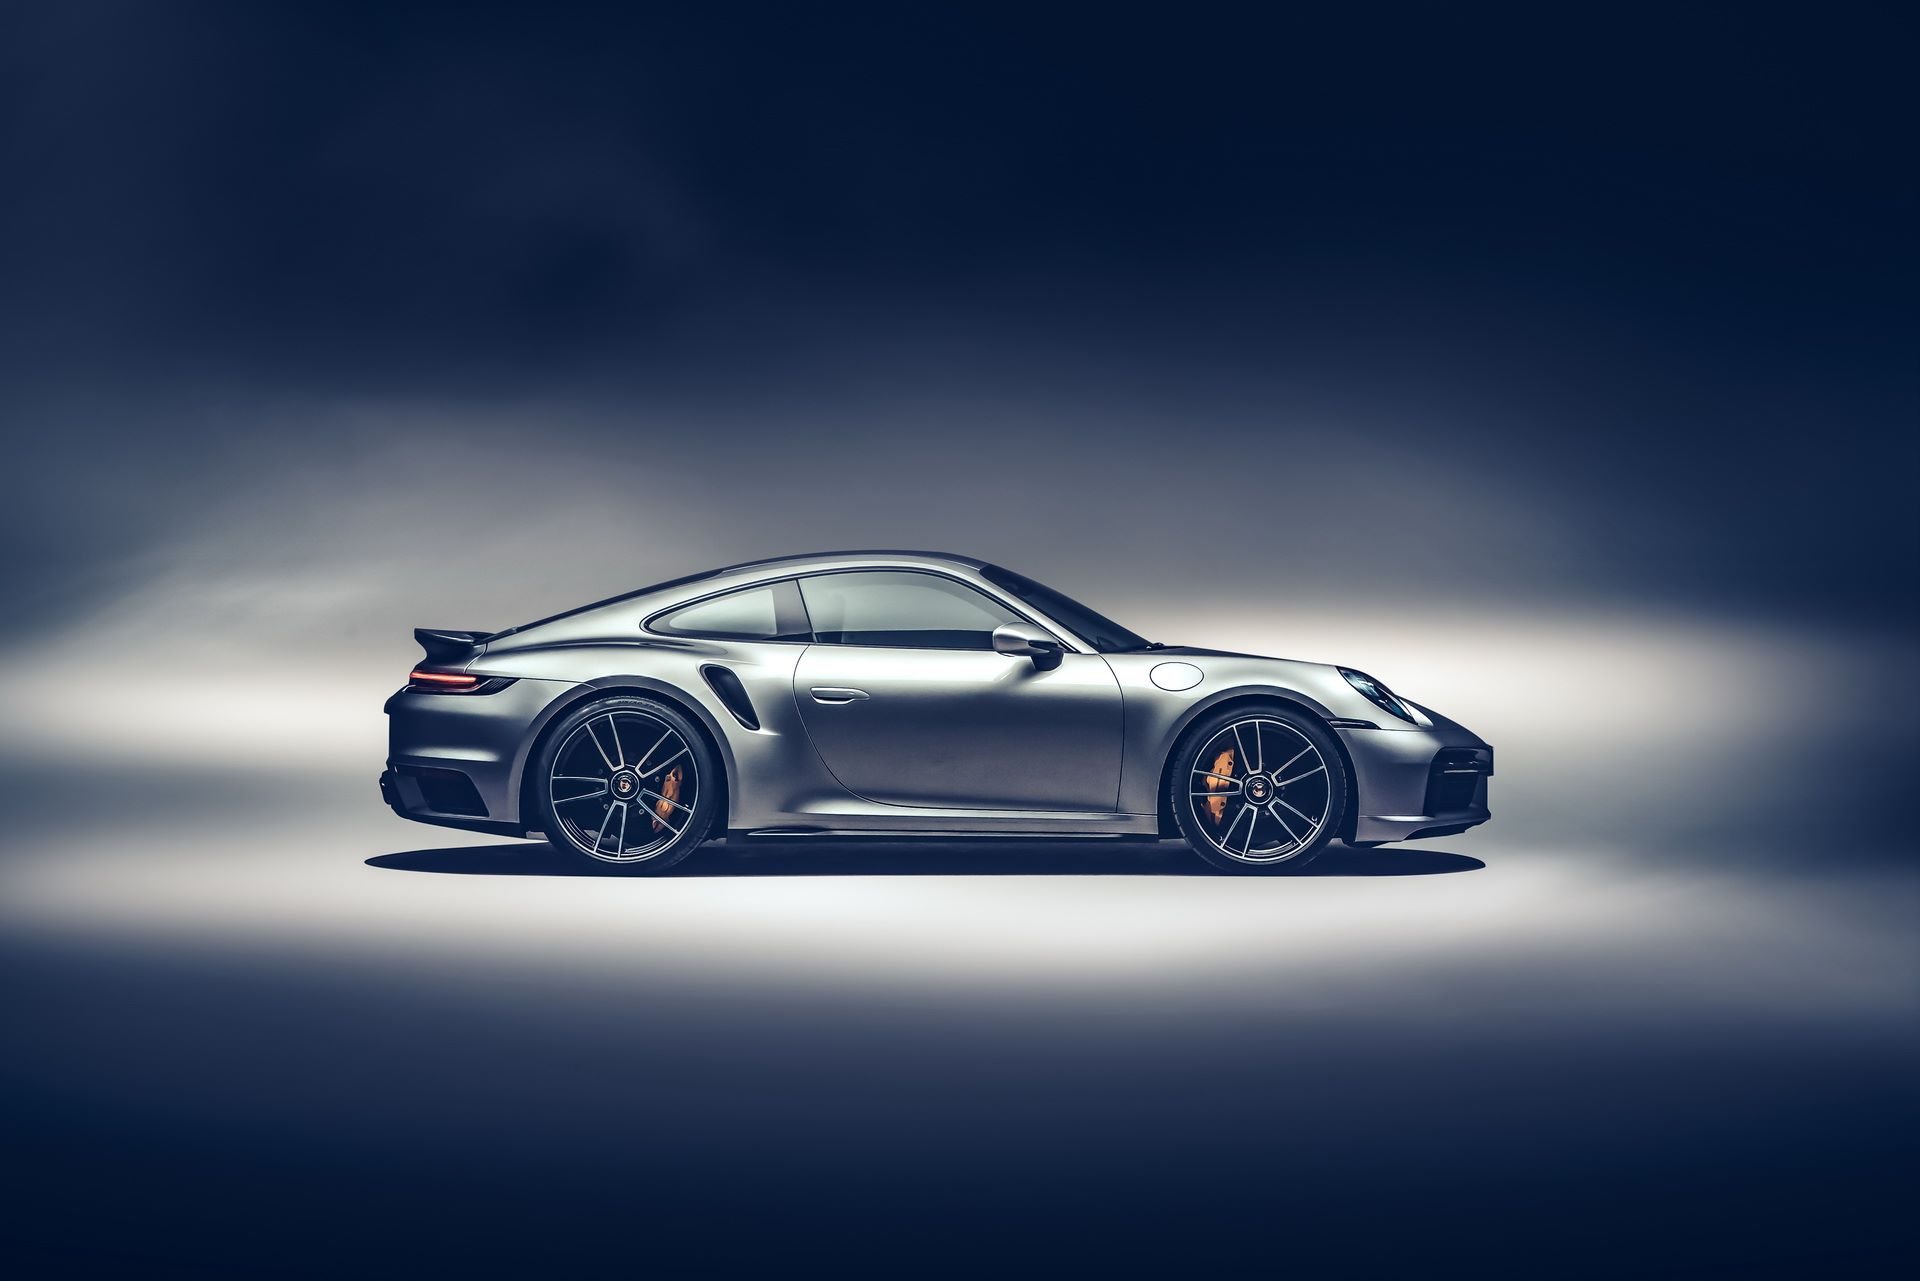 Porsche-911-Turbo-S-2020-13